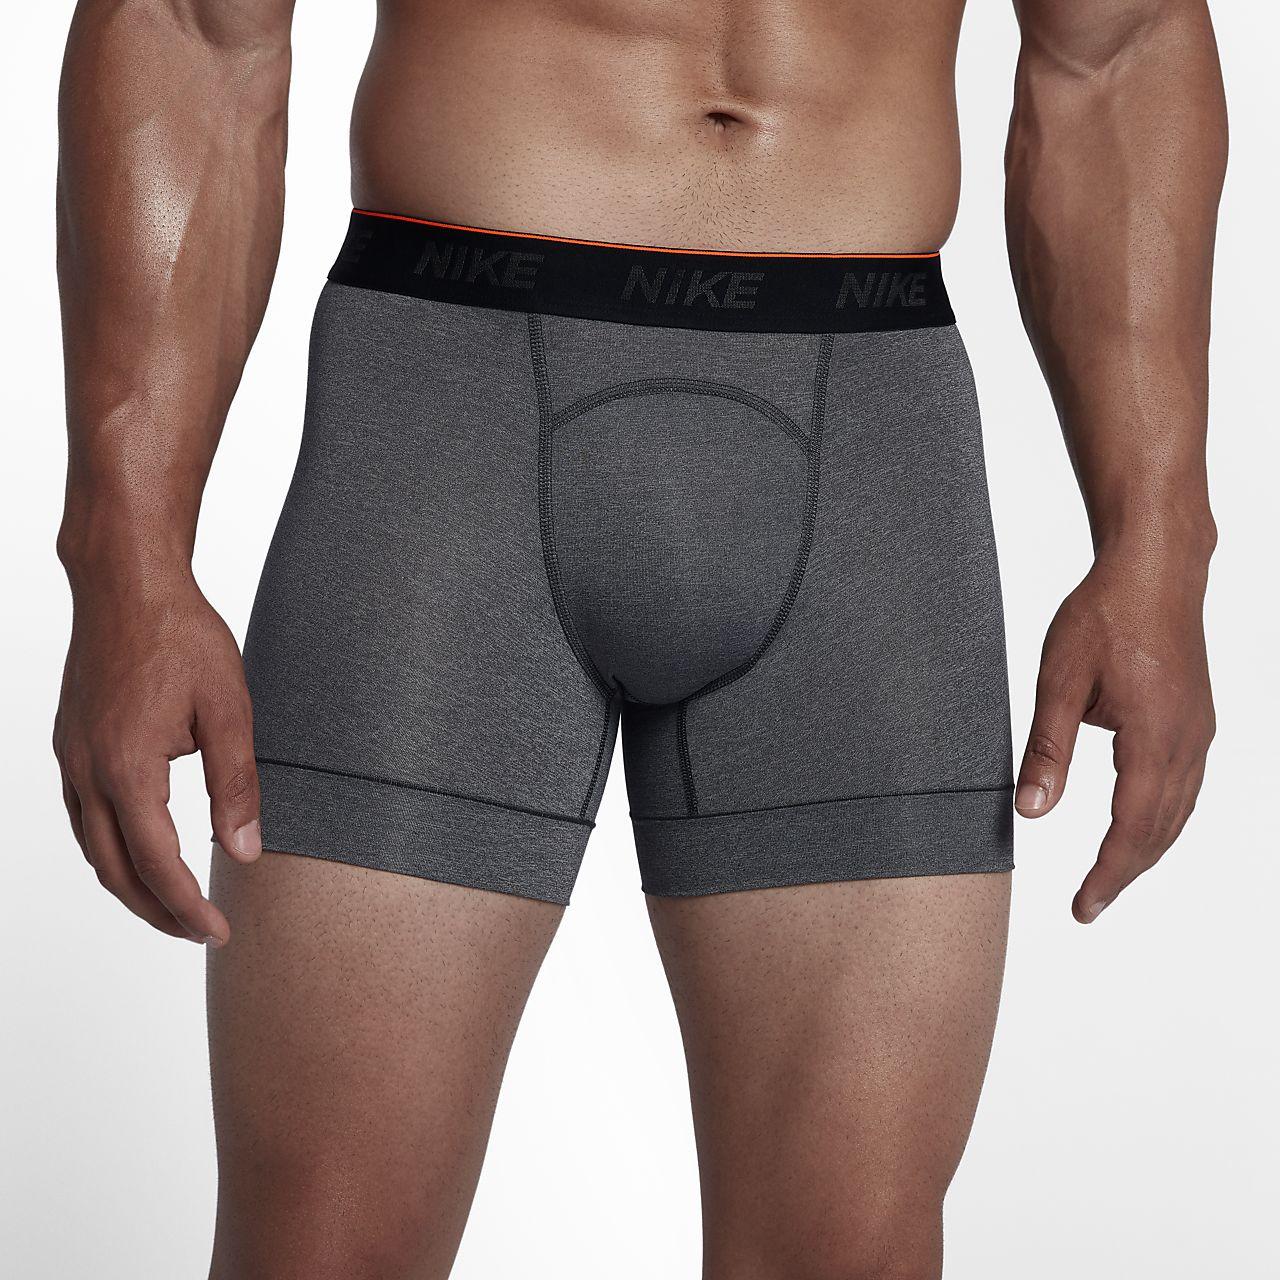 Nike Men's Underwear (2 Pairs)